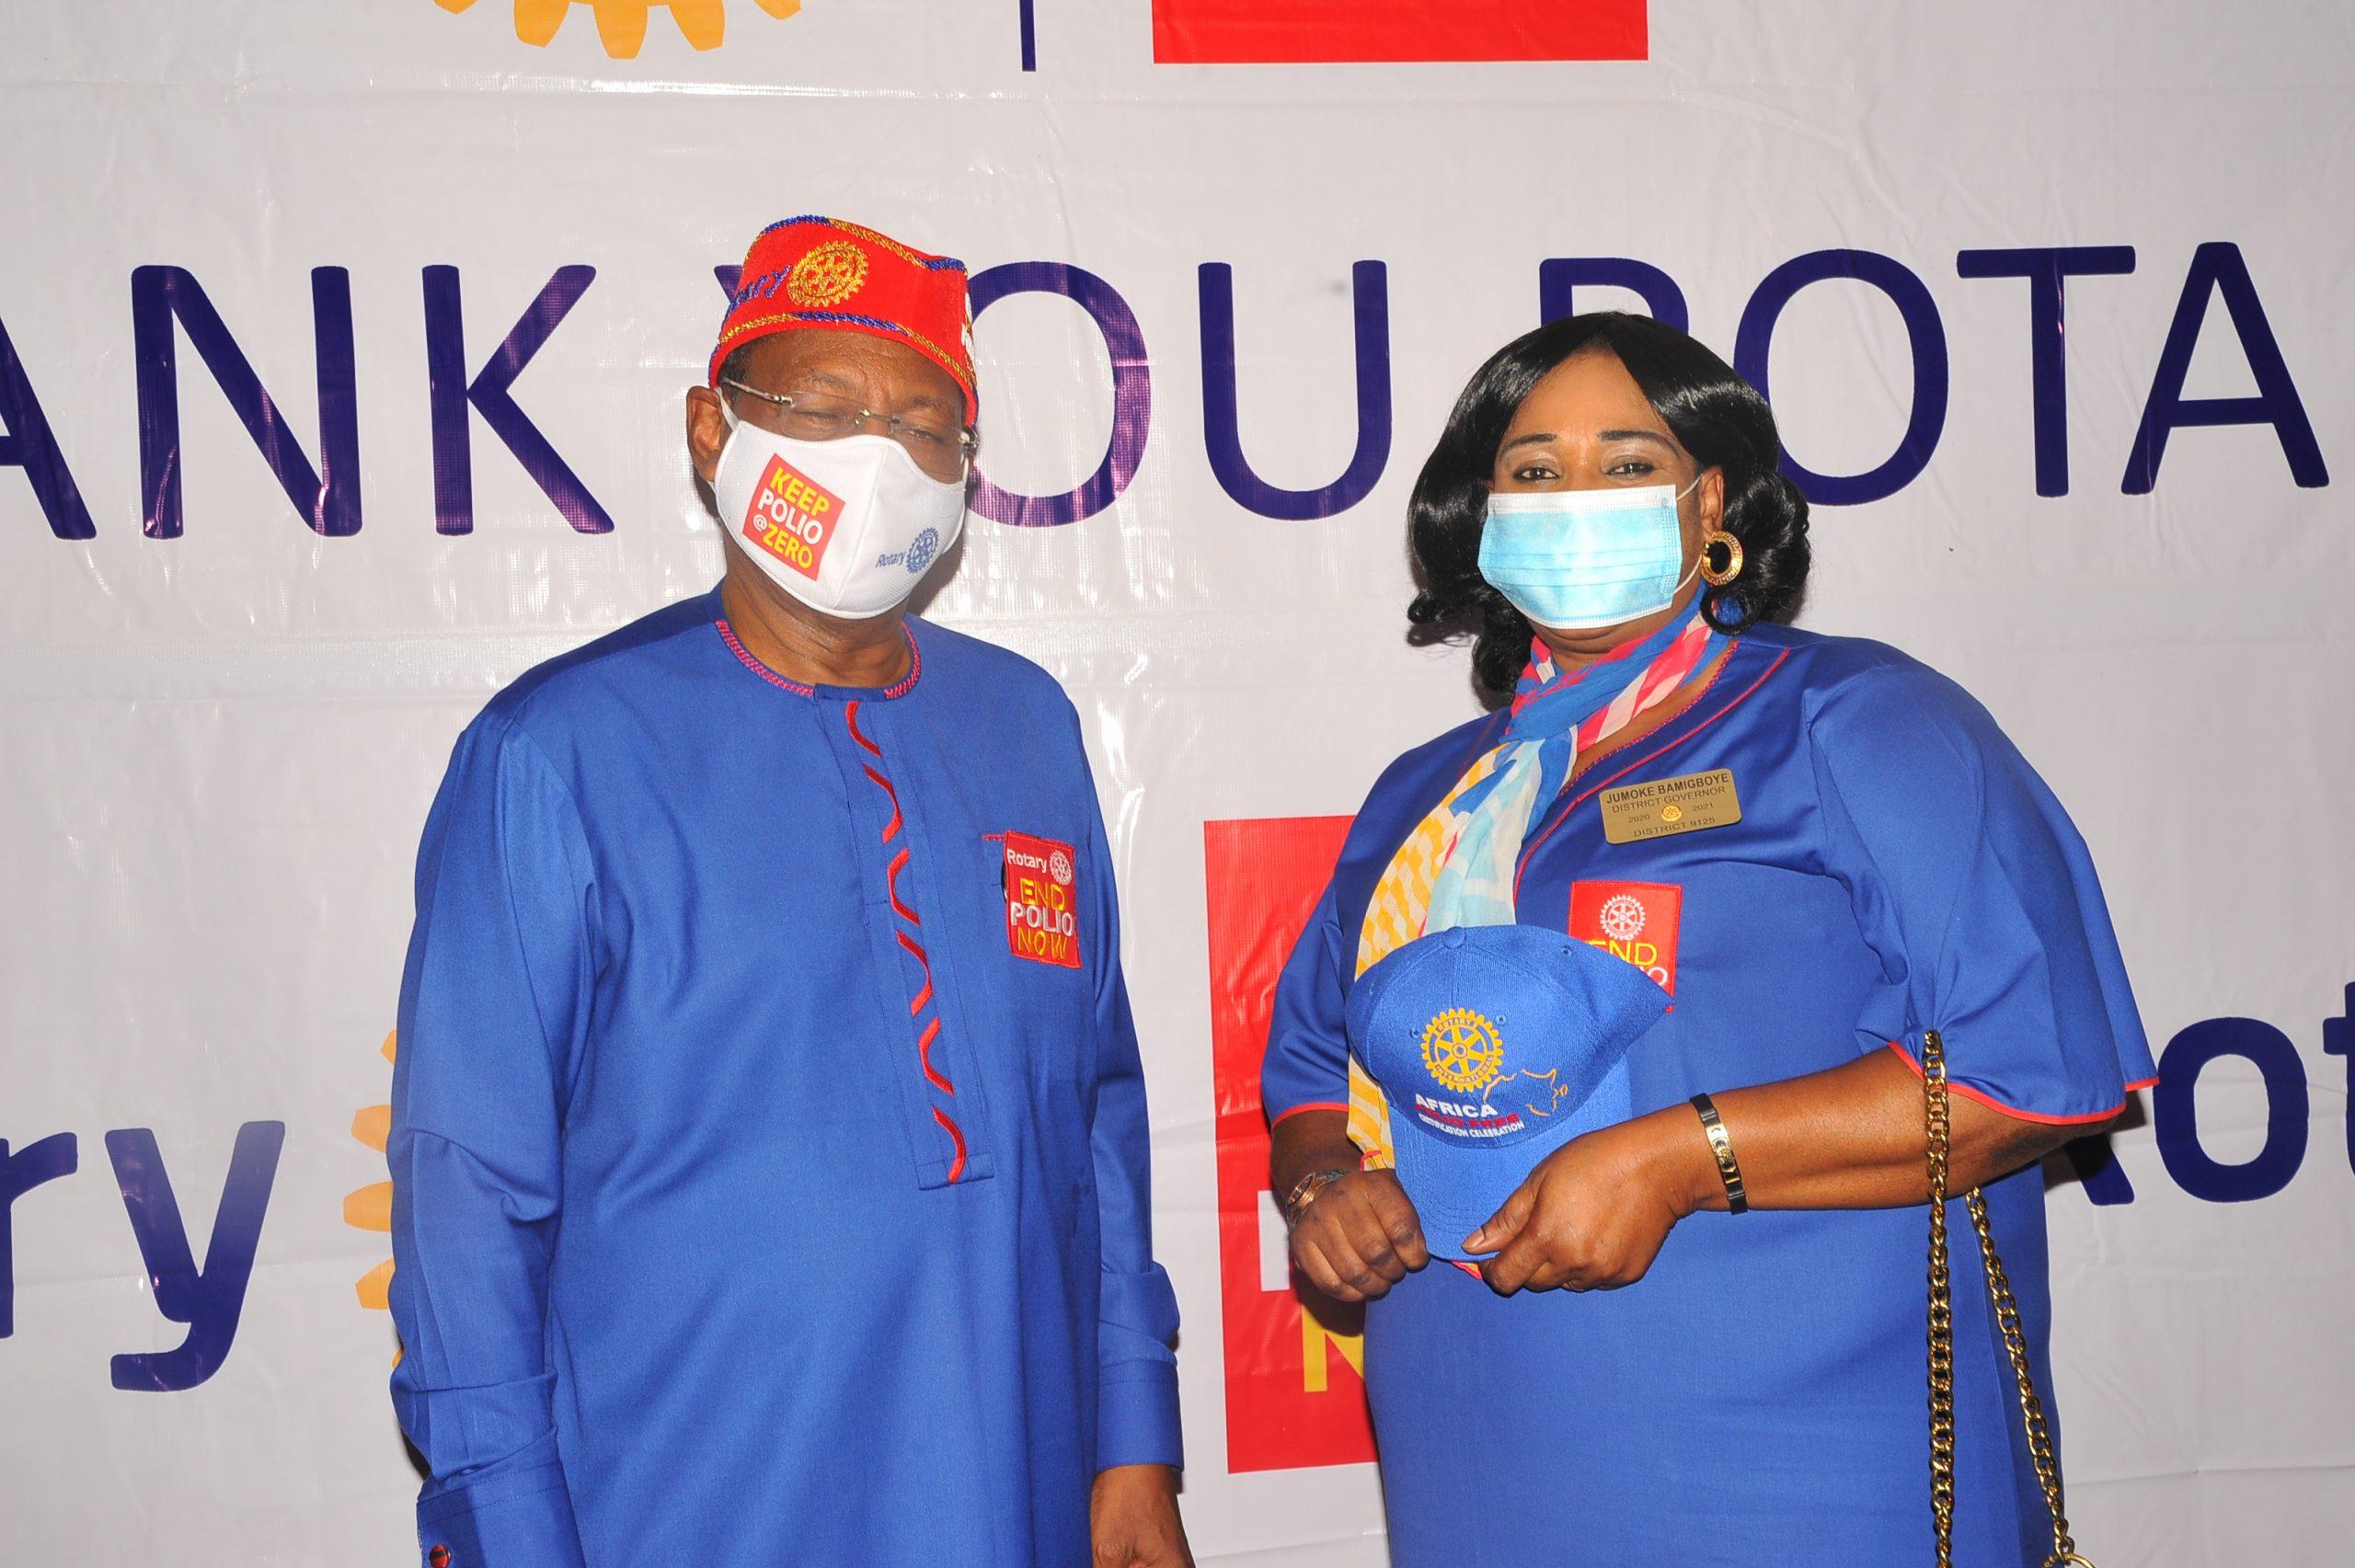 Dr Tunji Funsho and DG Jumoke Bamigboye